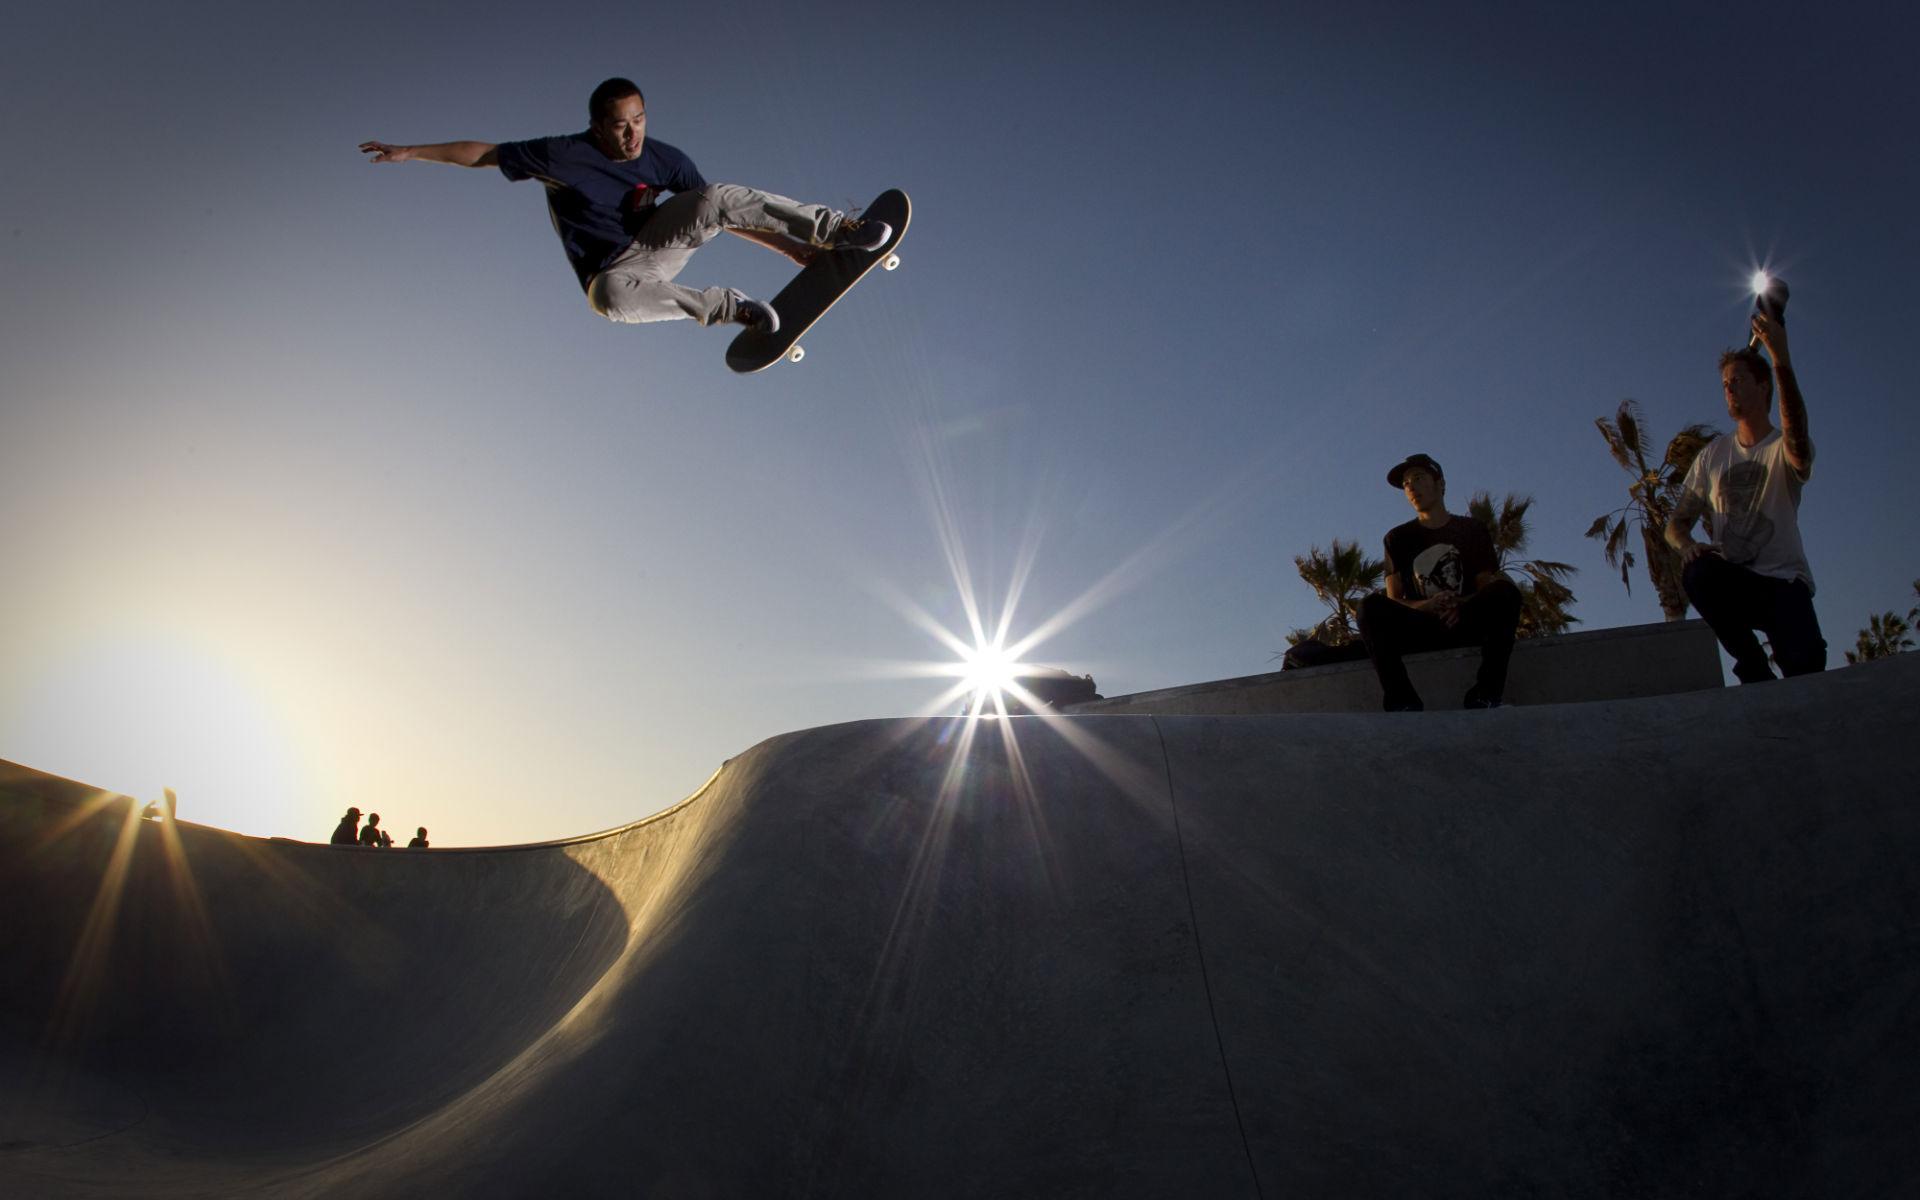 pin skate hd skateboard wallpaper with 1280x800 resolution